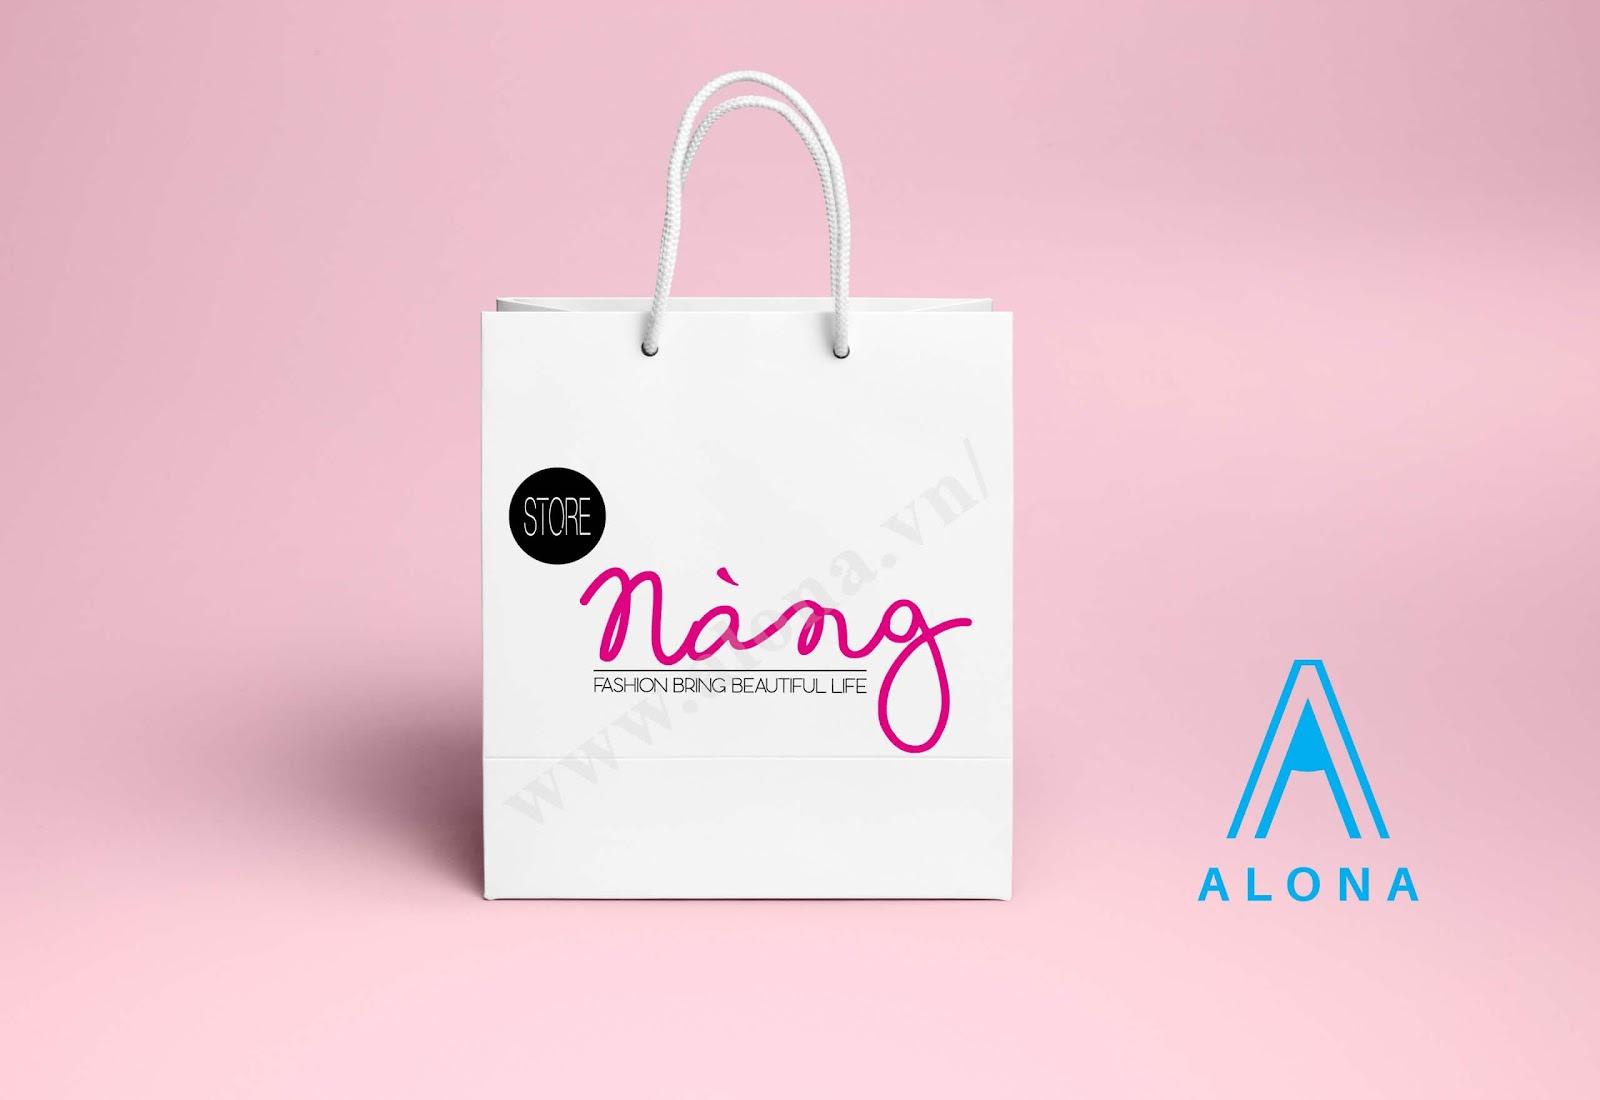 In túi giấy cho shop mỹ phẩm sam - Alona